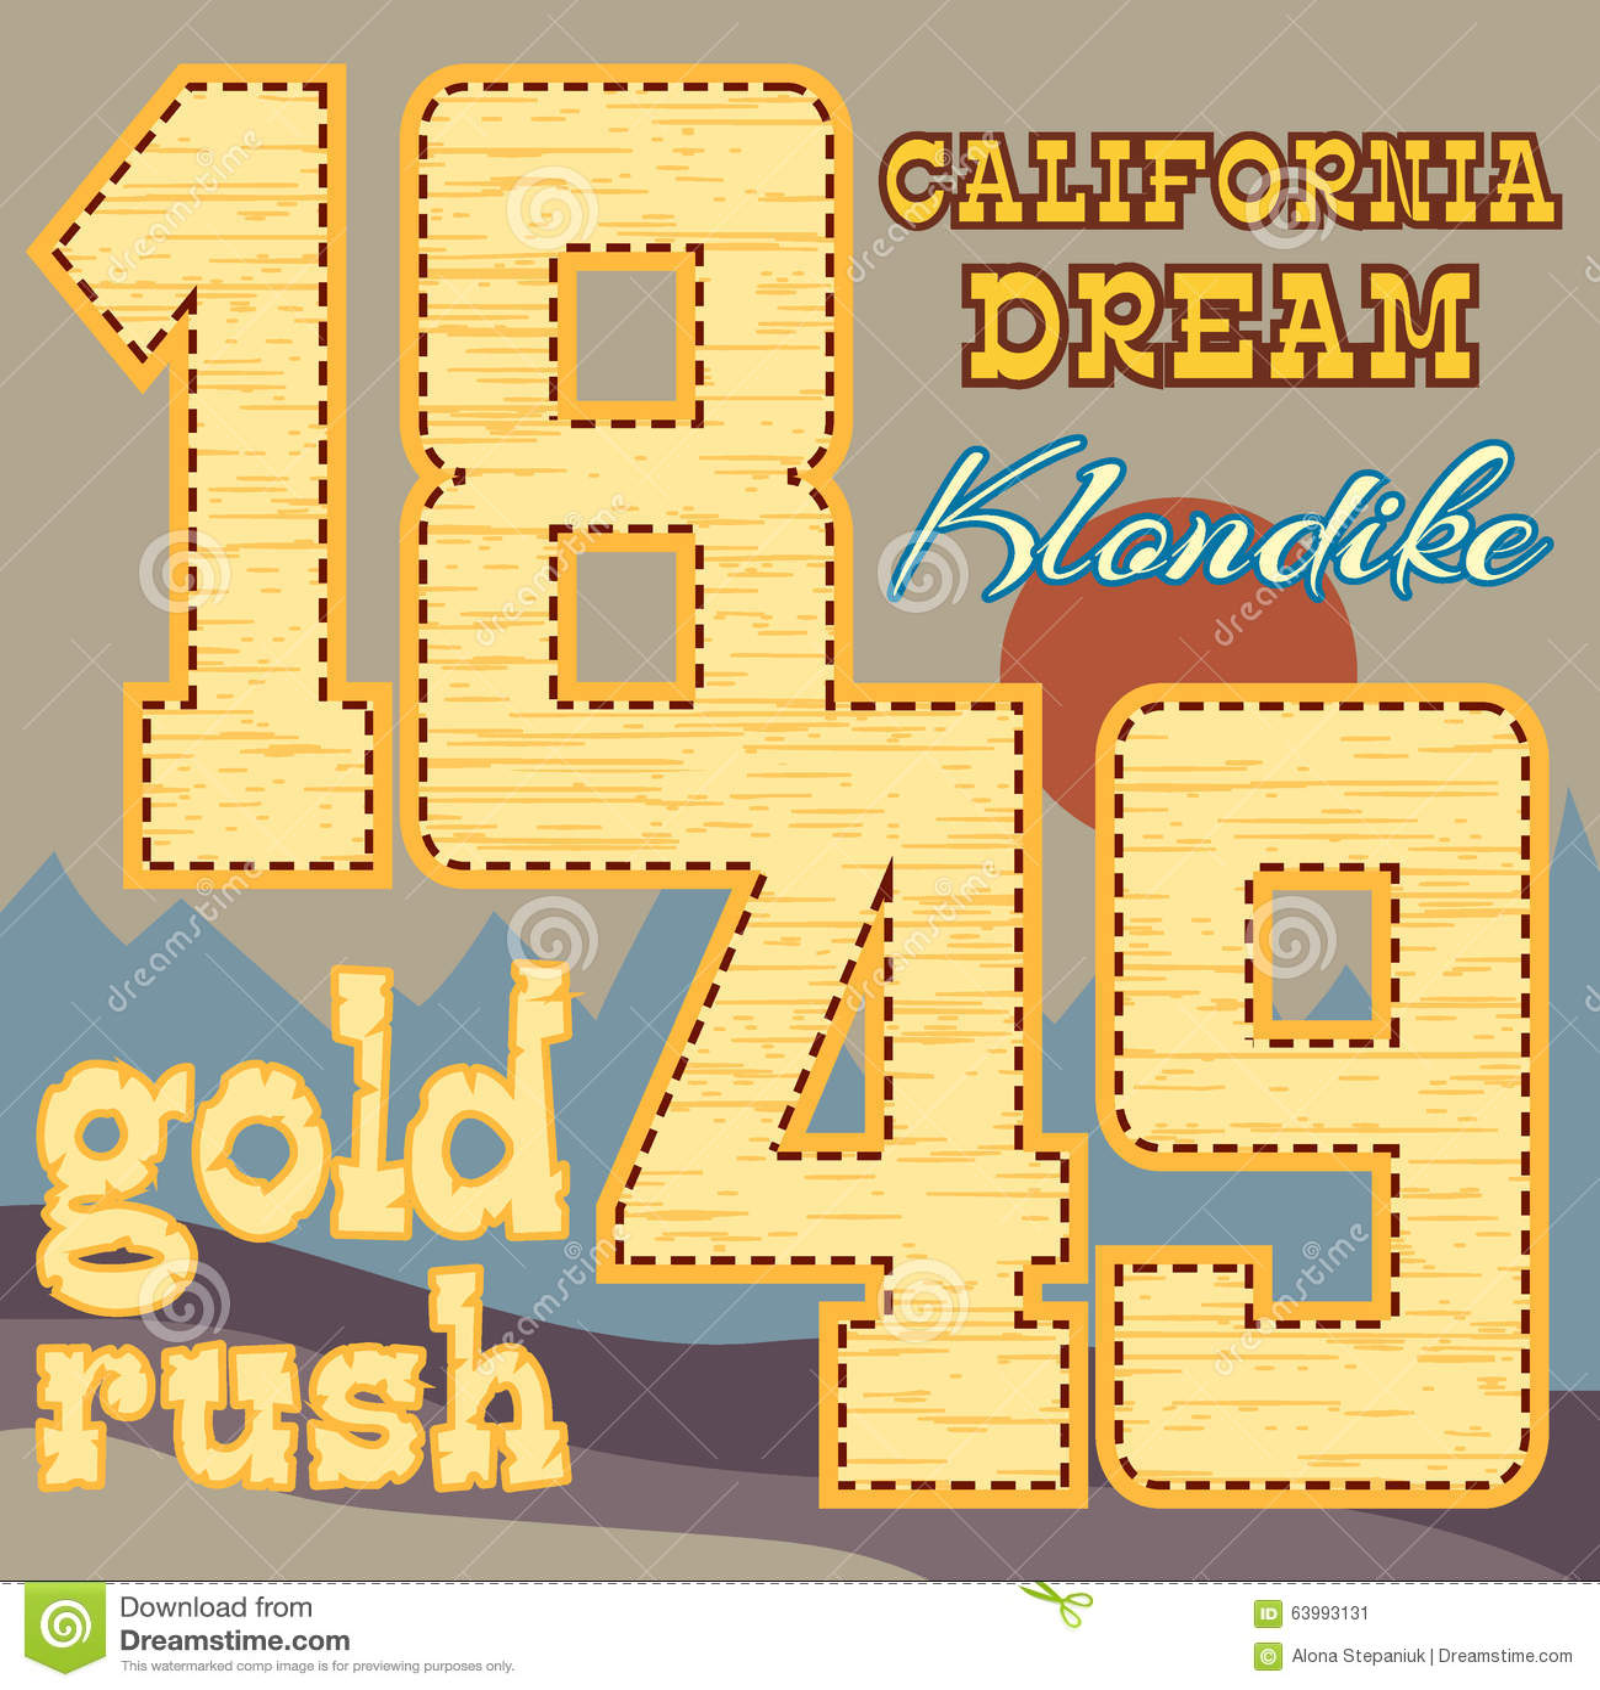 California dream clothing store